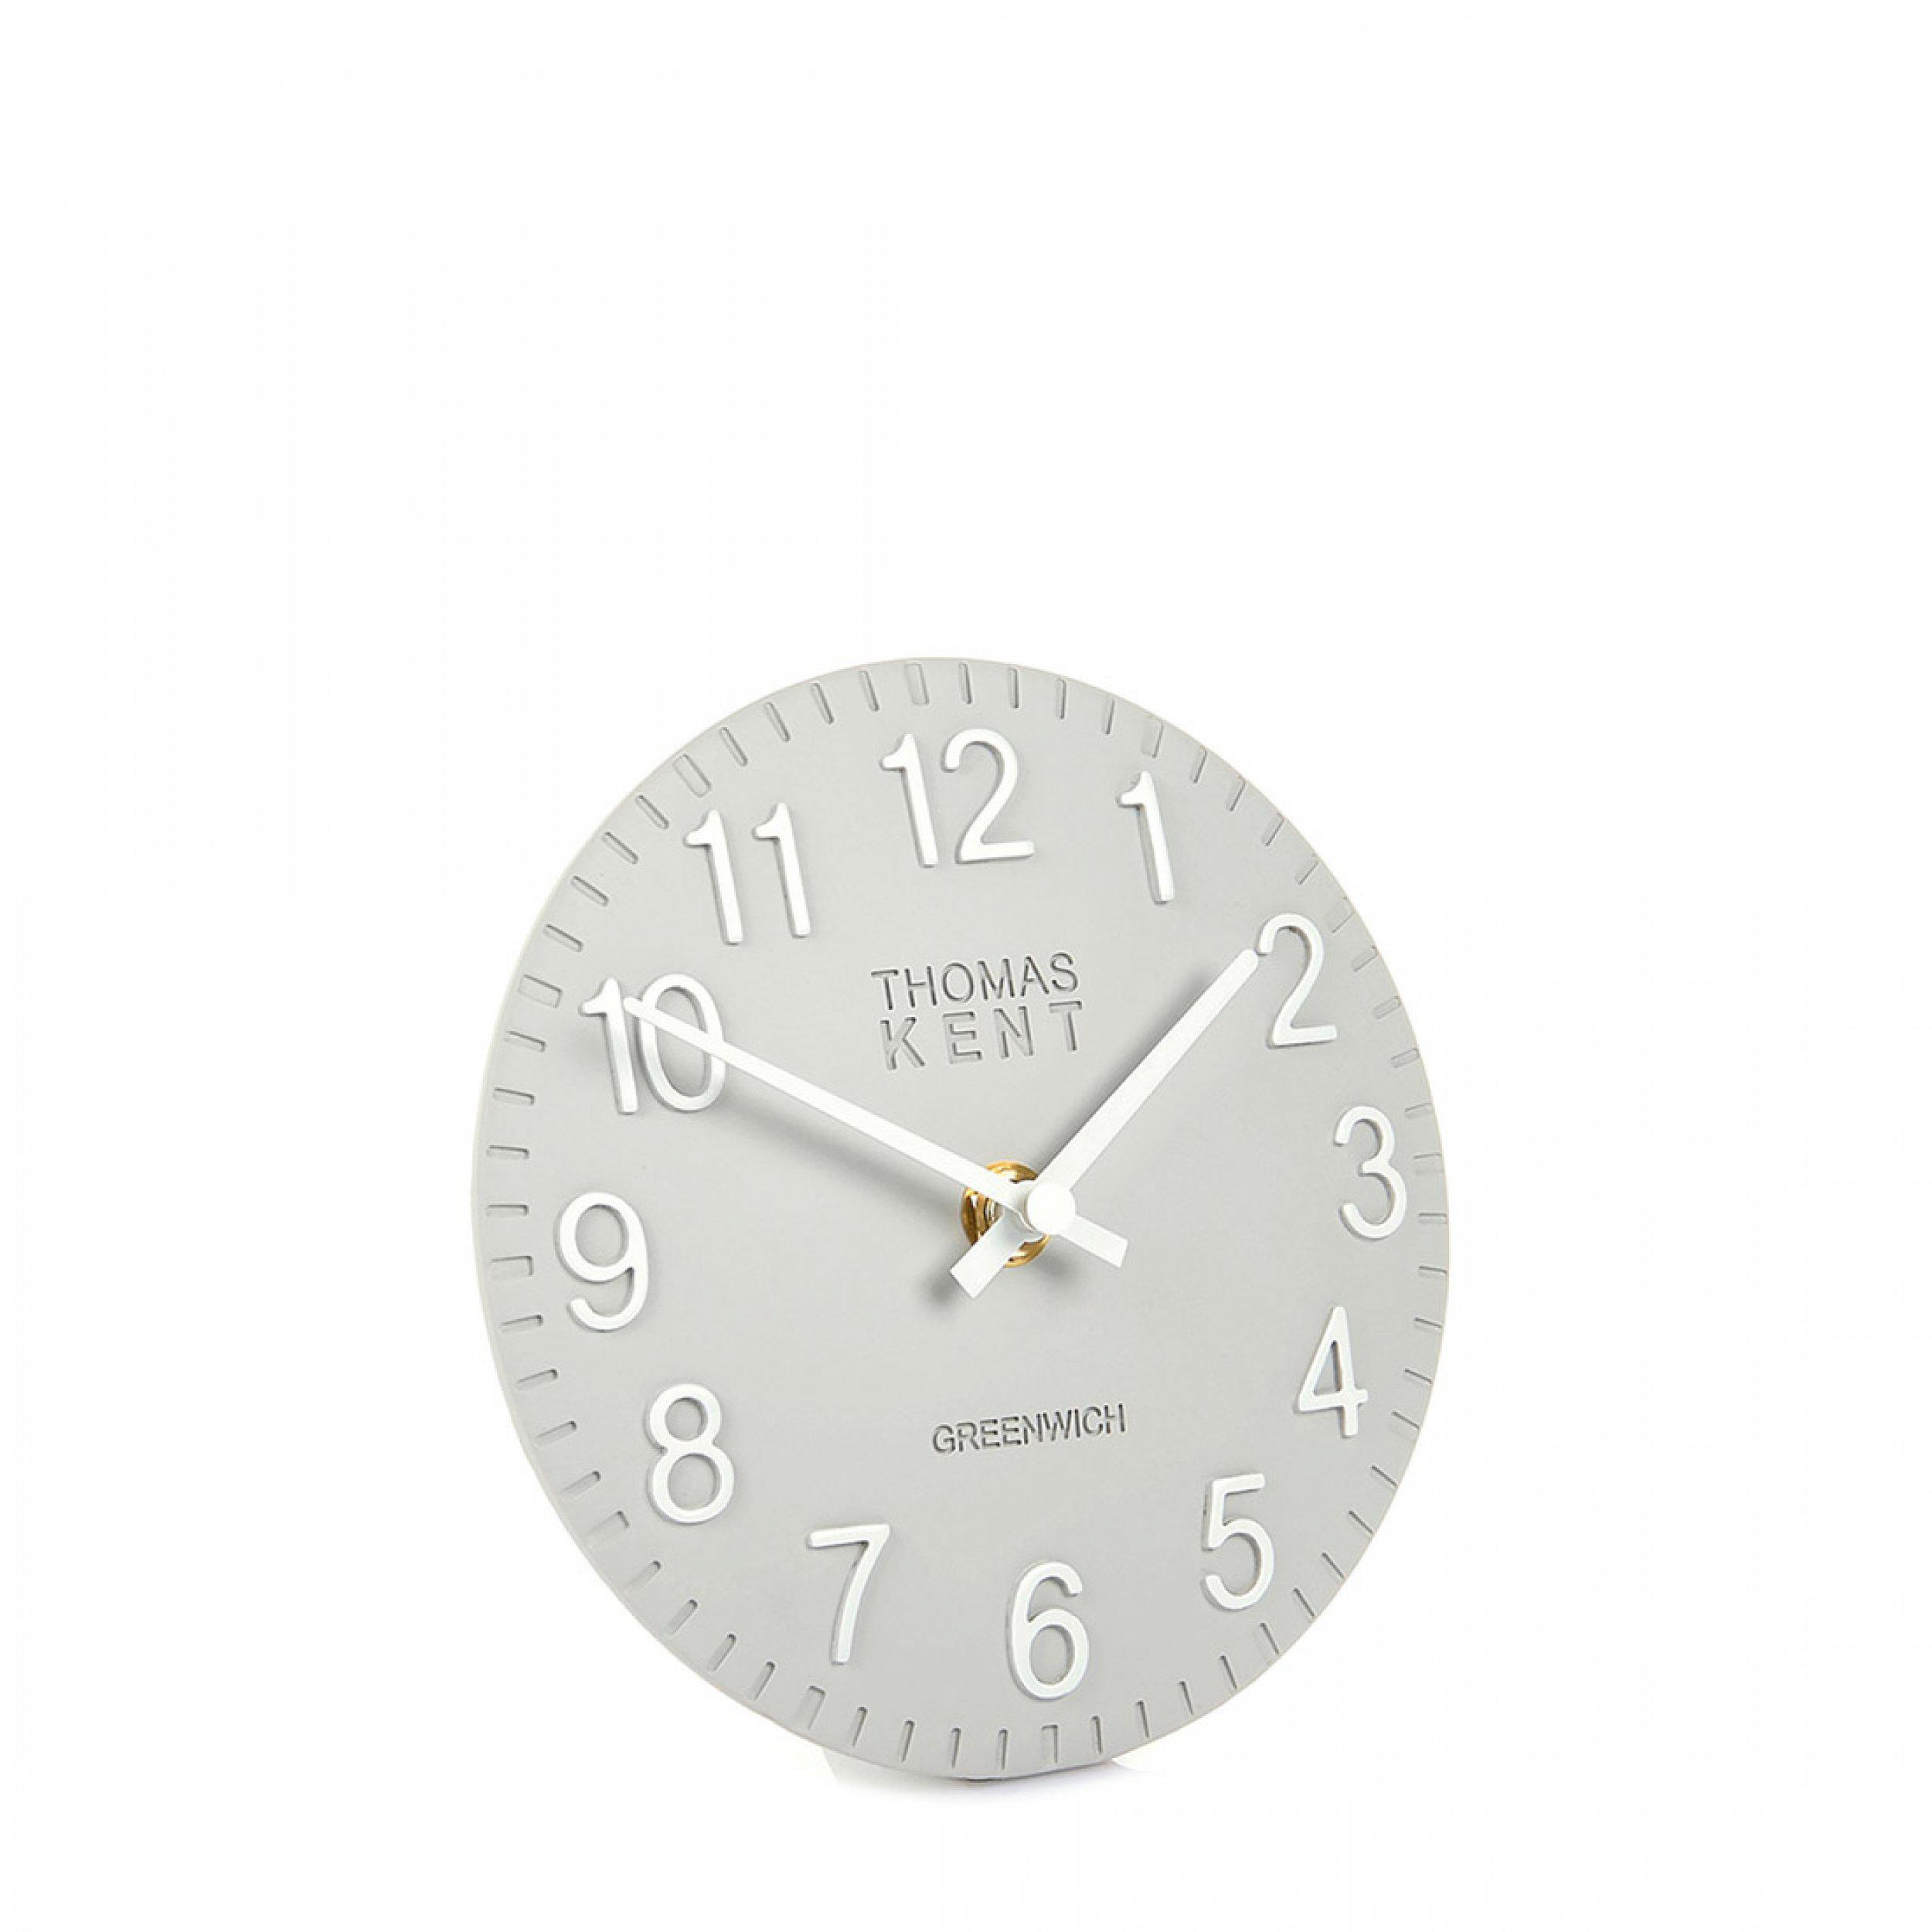 "Thomas Kent 6"" Cotswold Mantel Clock Smokem"